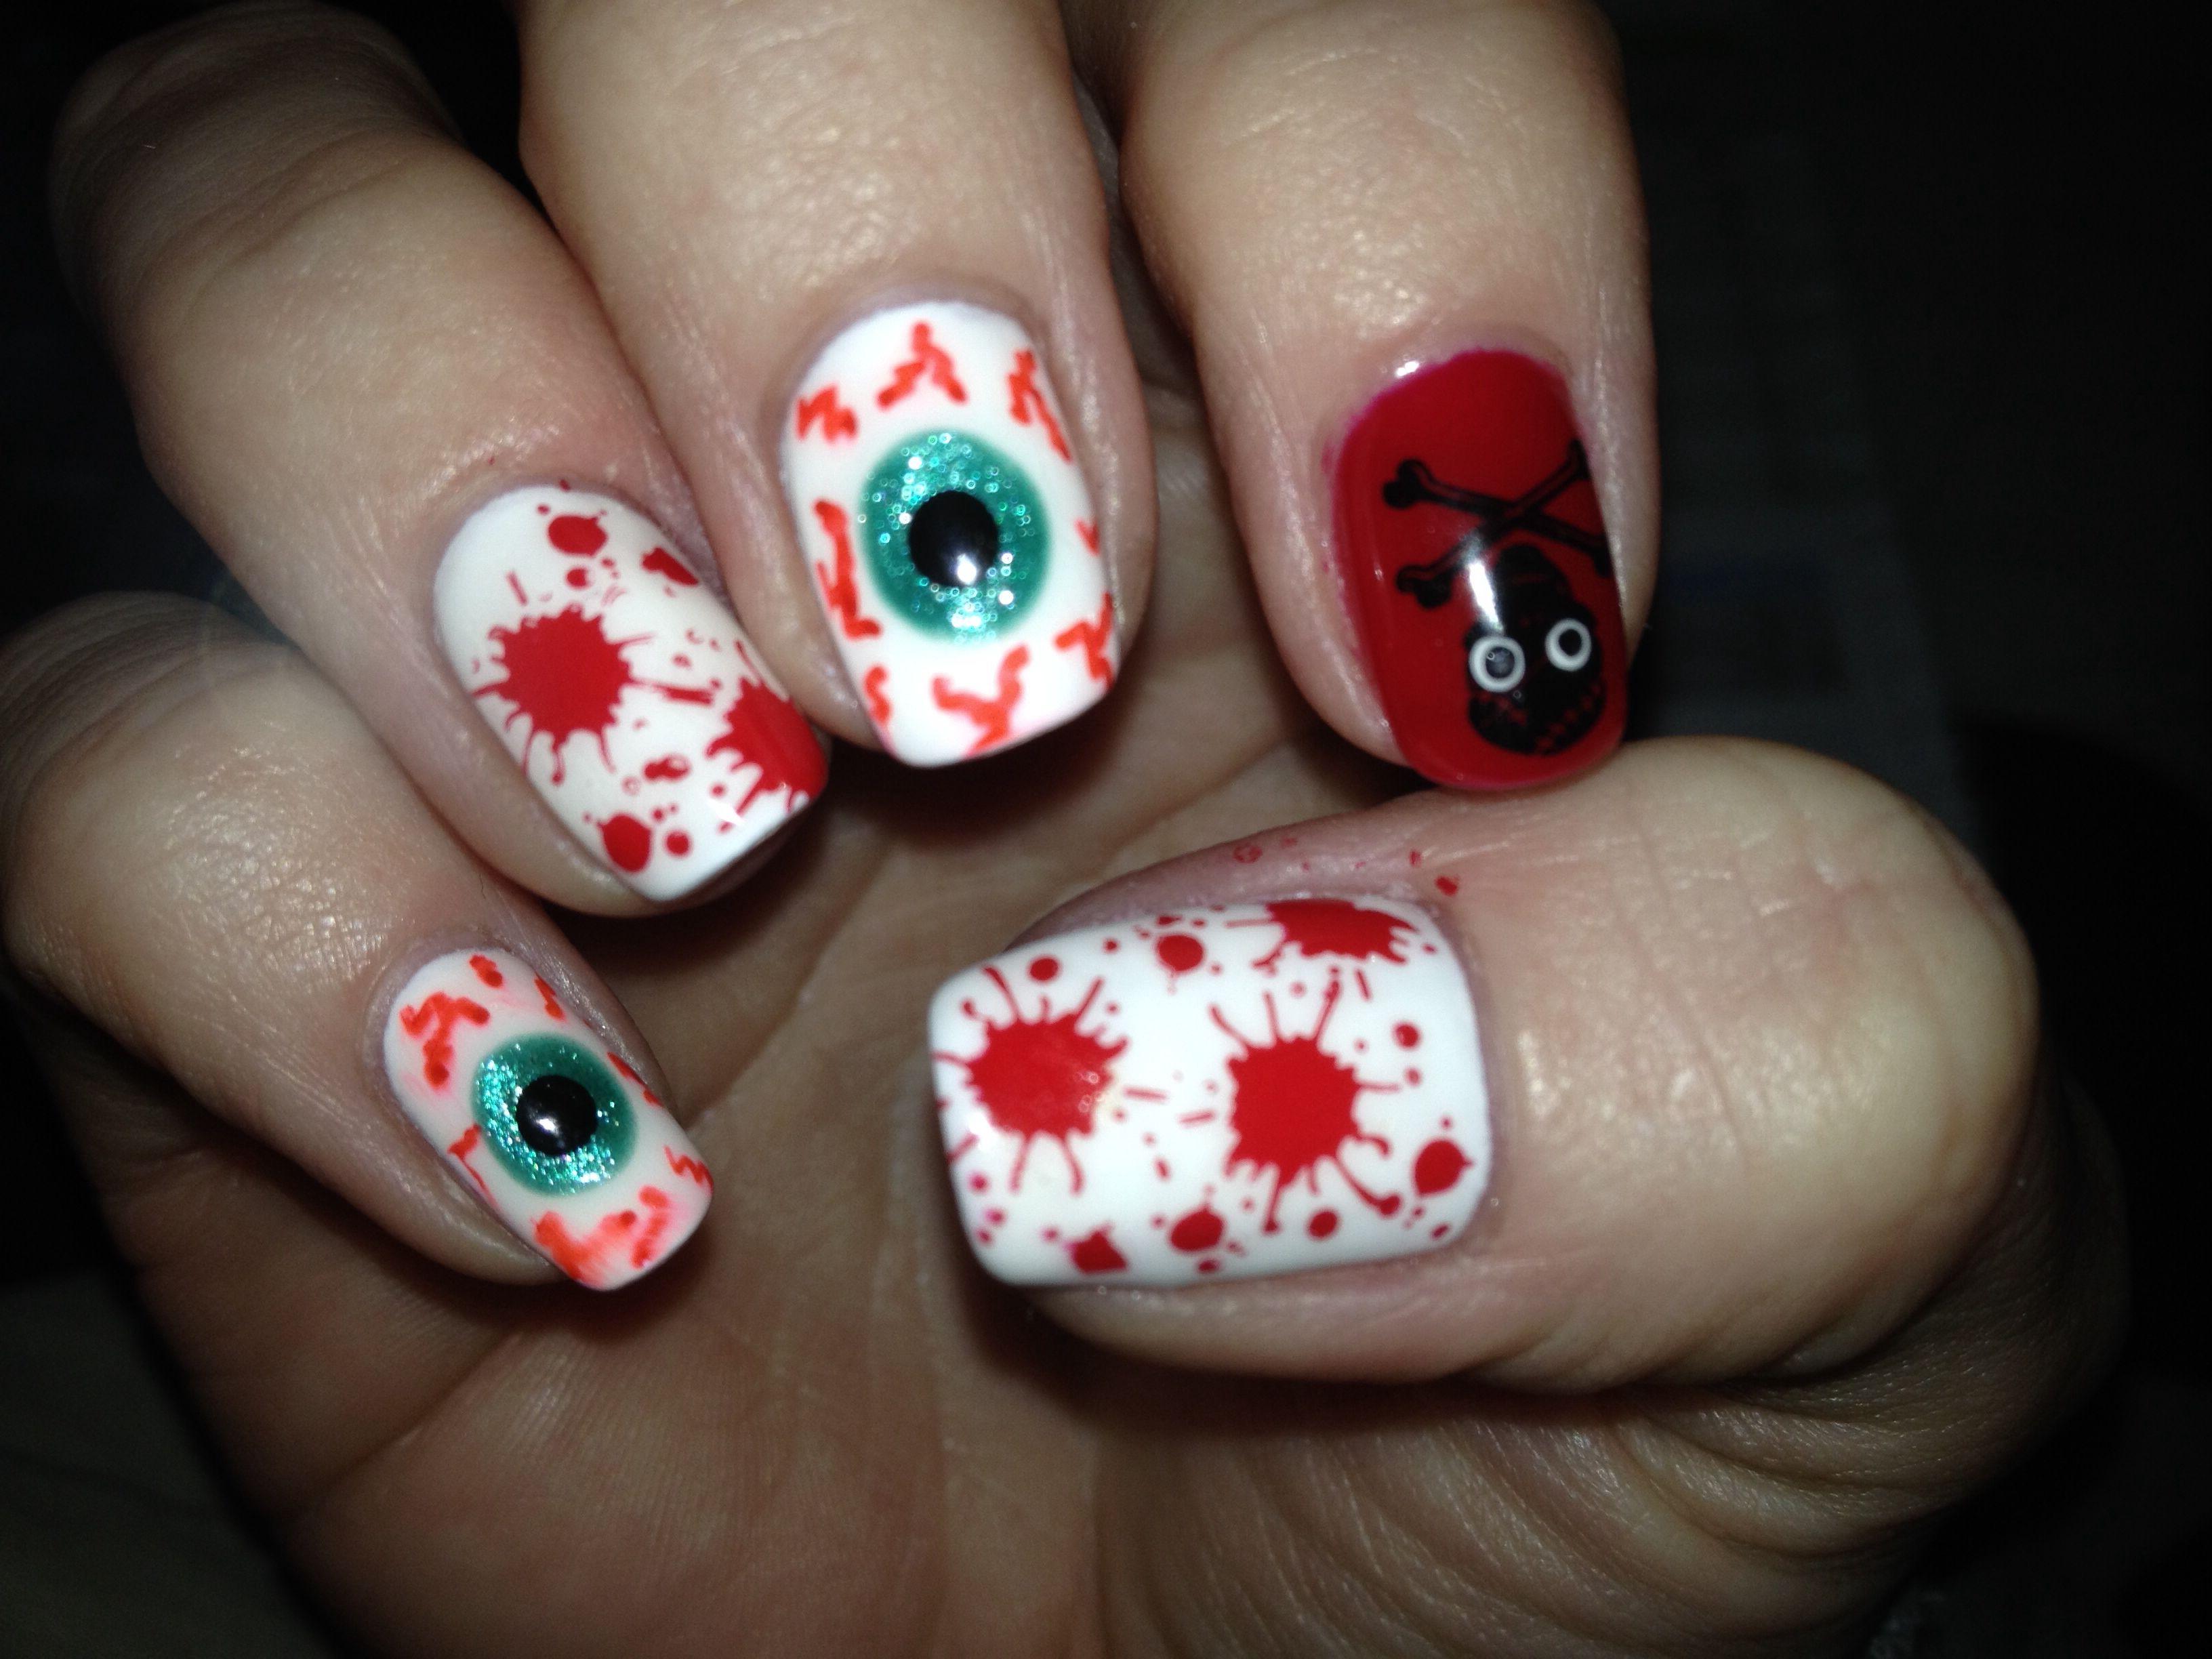 Halloween finger nails 2013 | Nails, Fingernails